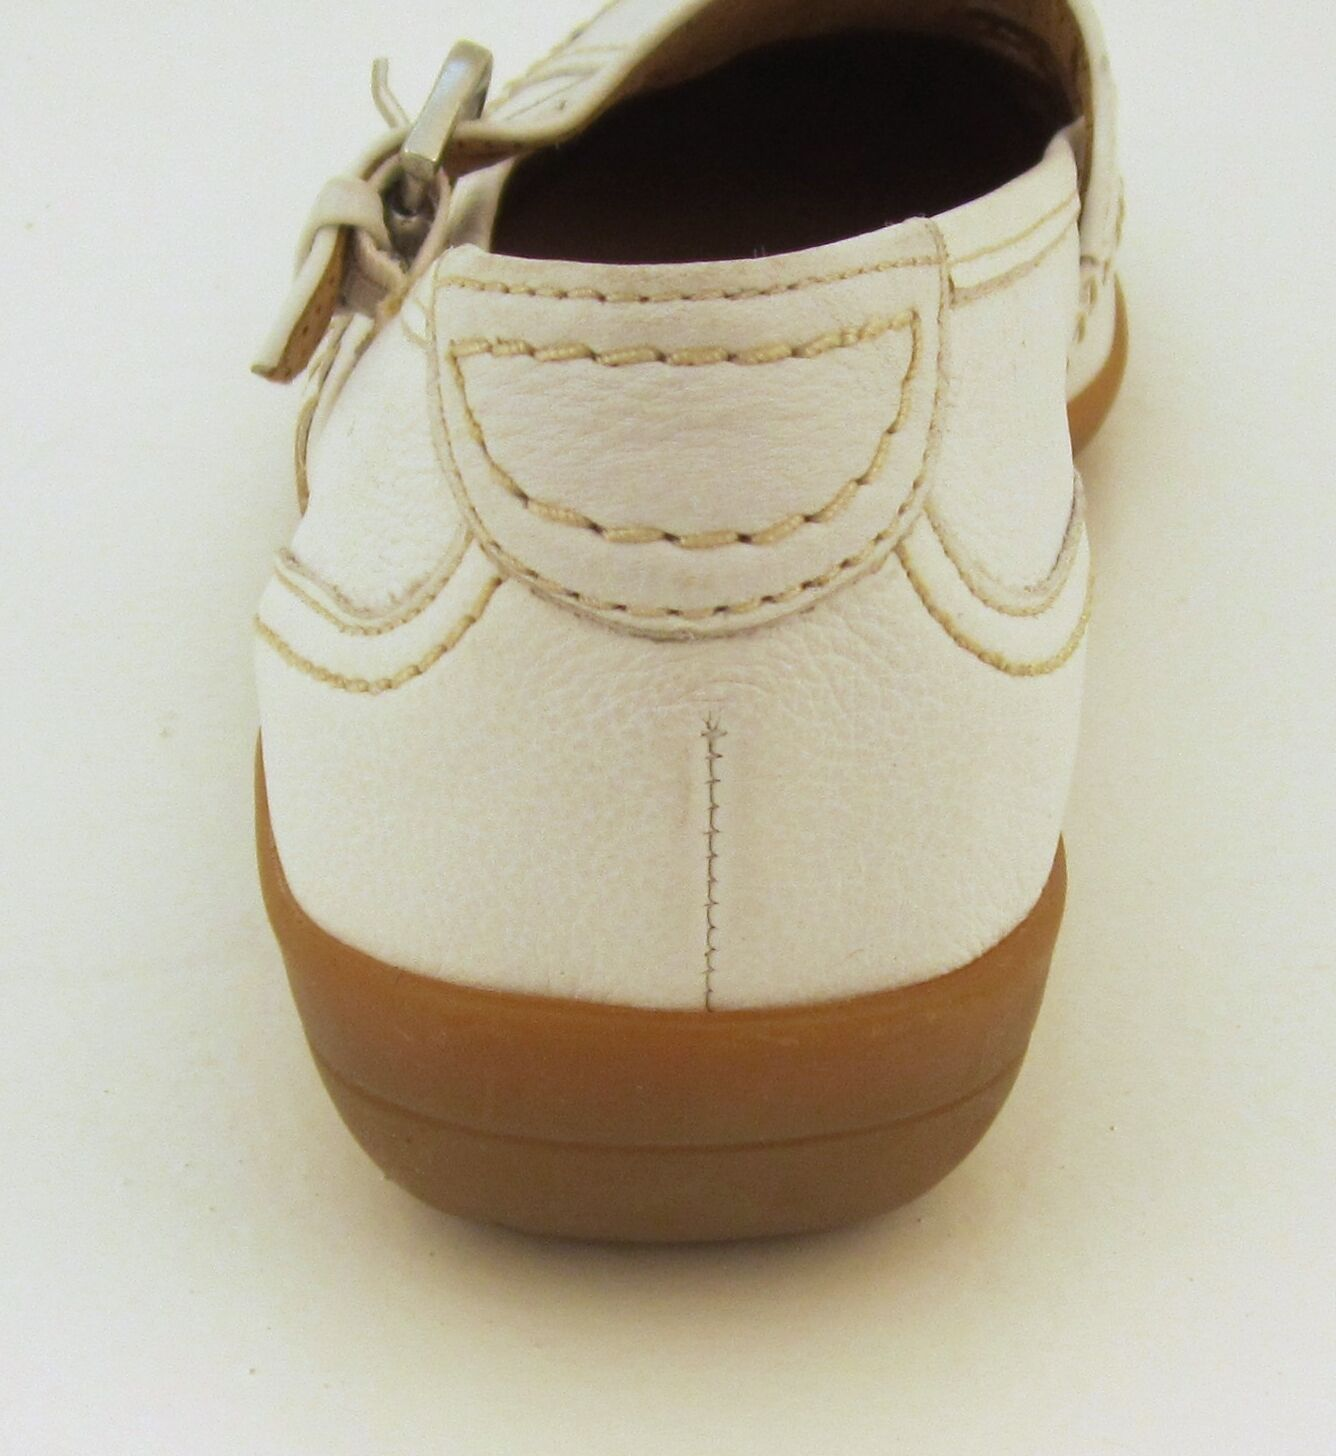 BASSE TG GABOR Slipper comfort echt Leder rohweiss TG BASSE 5 = 38 Larghezza: G d3832c